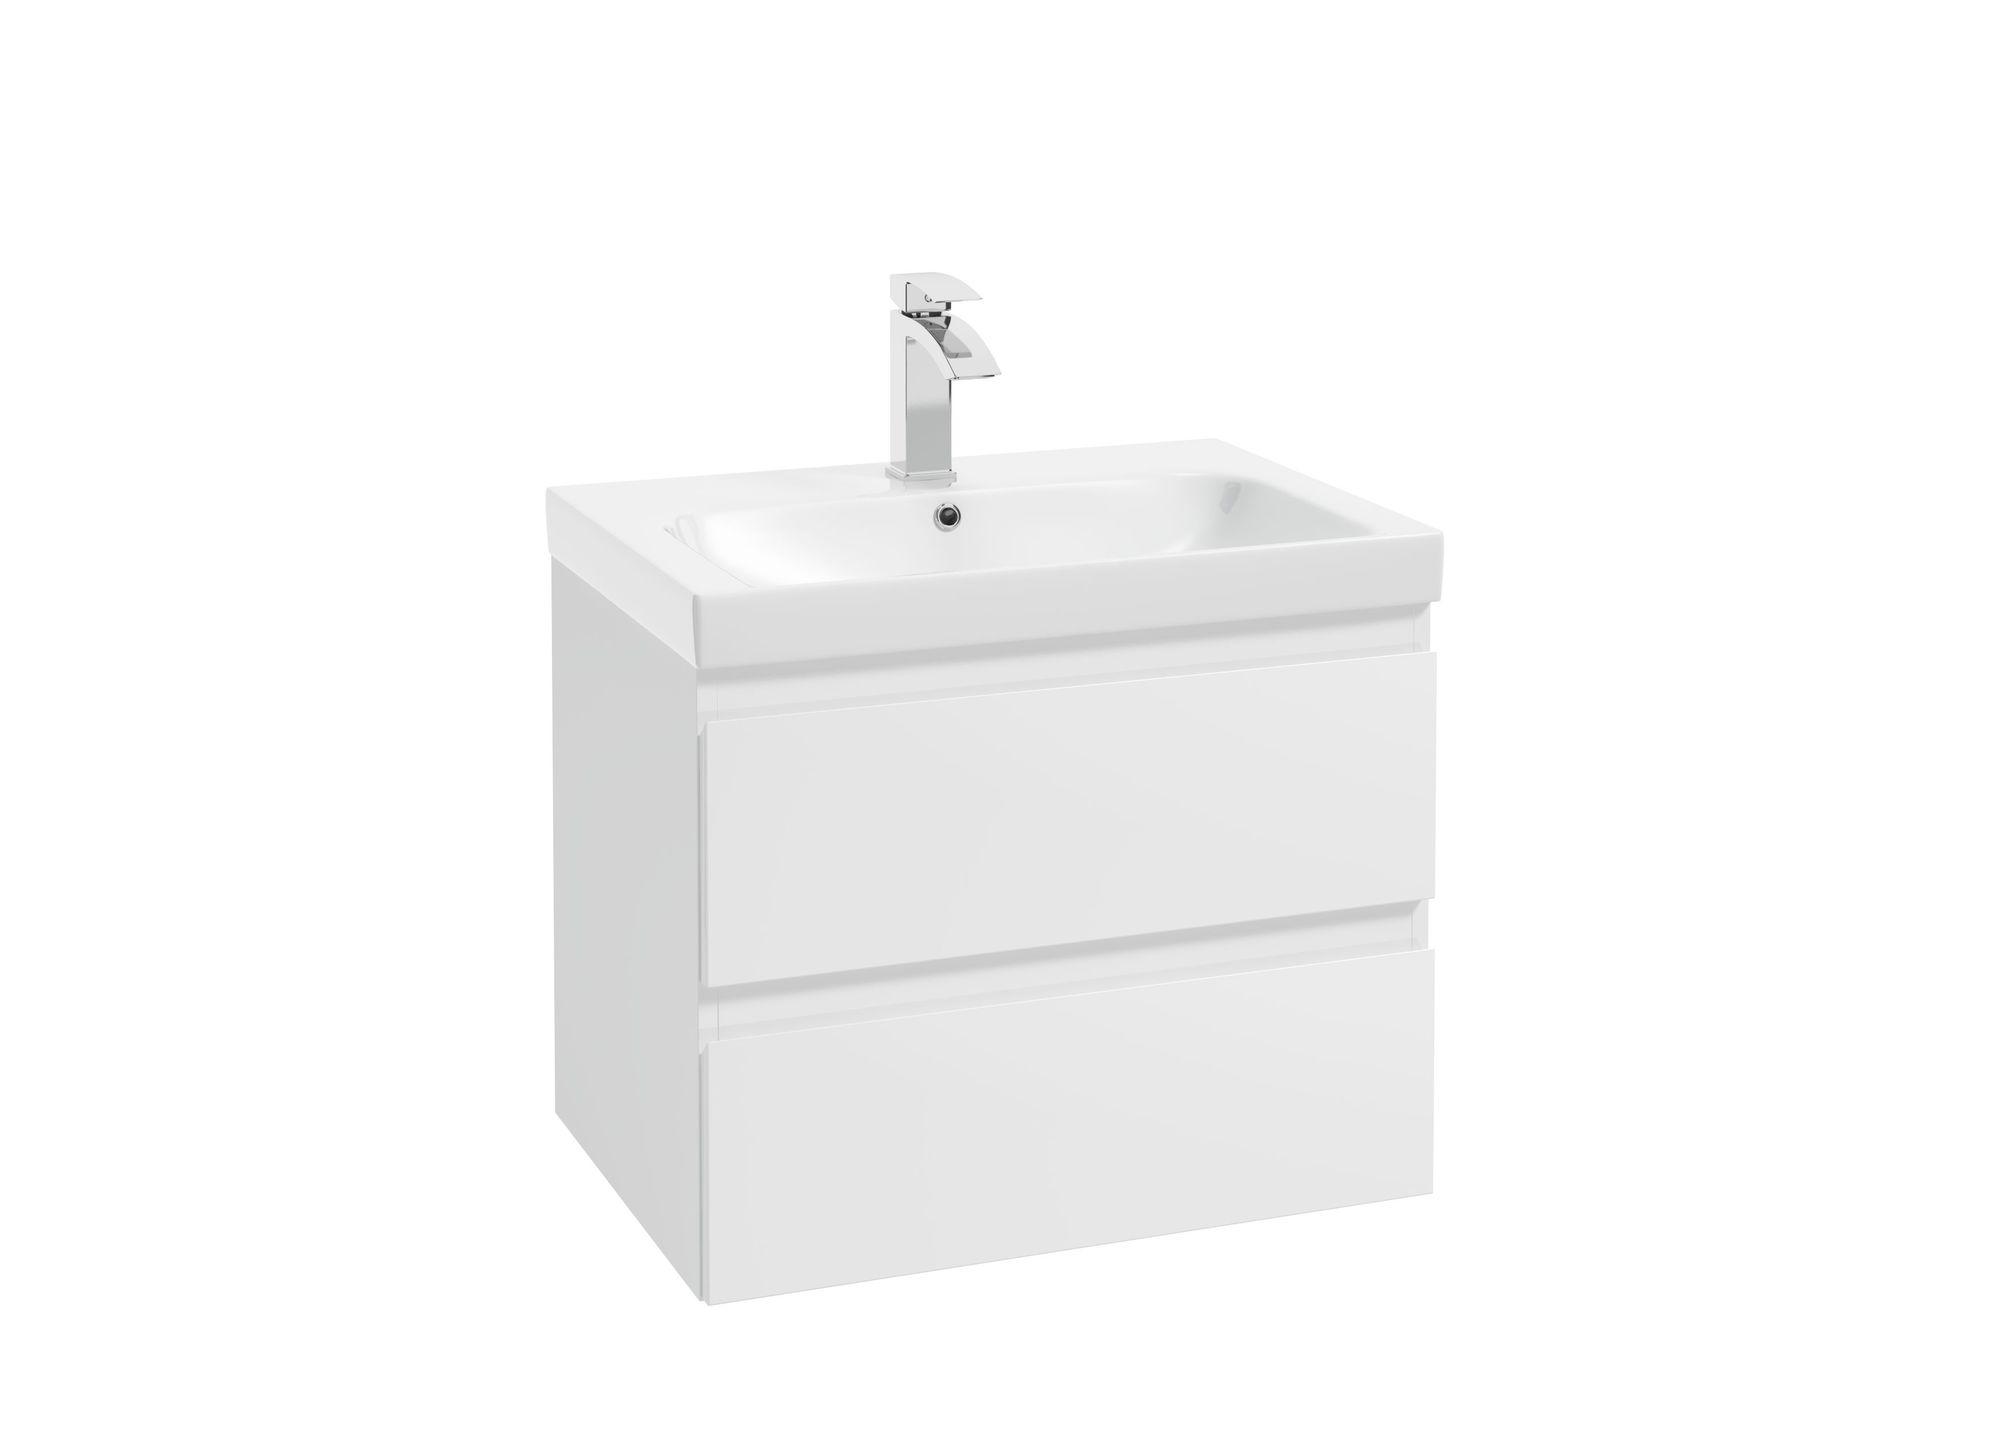 Szafka podumywalkowa Defra Como D65 biały połysk 63,2x51x42,6cm 123-D-06501